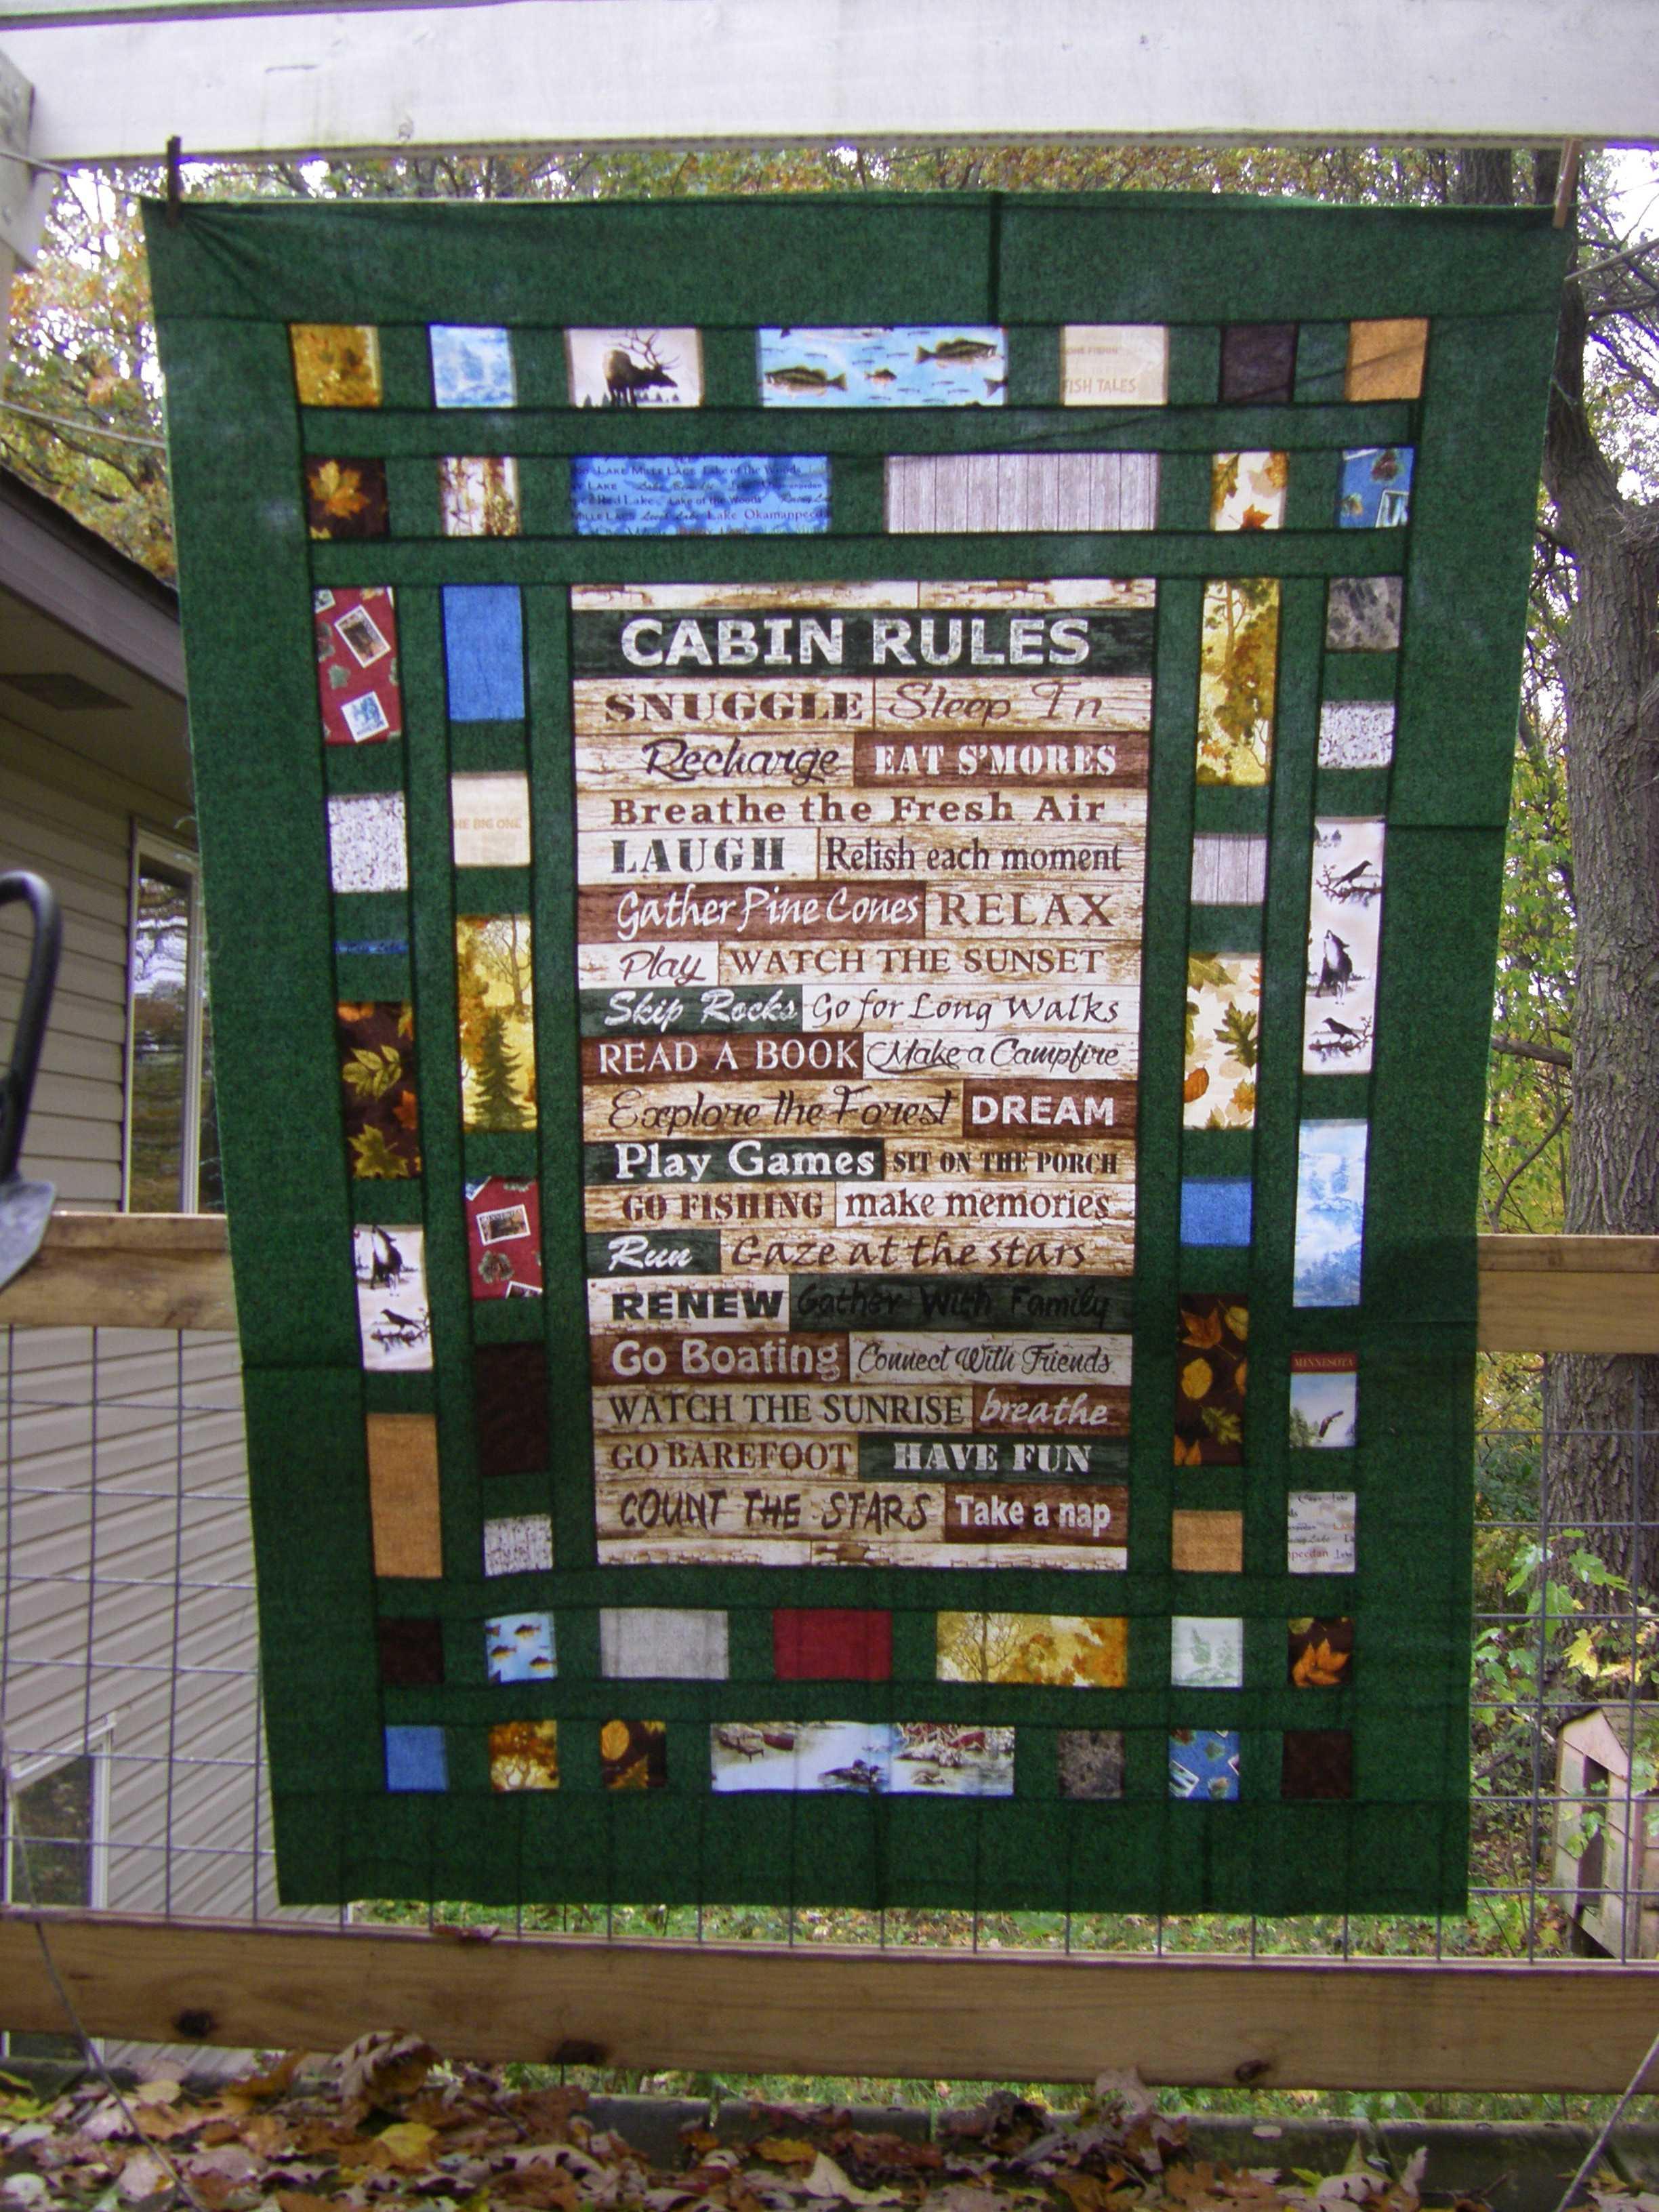 CabinRules